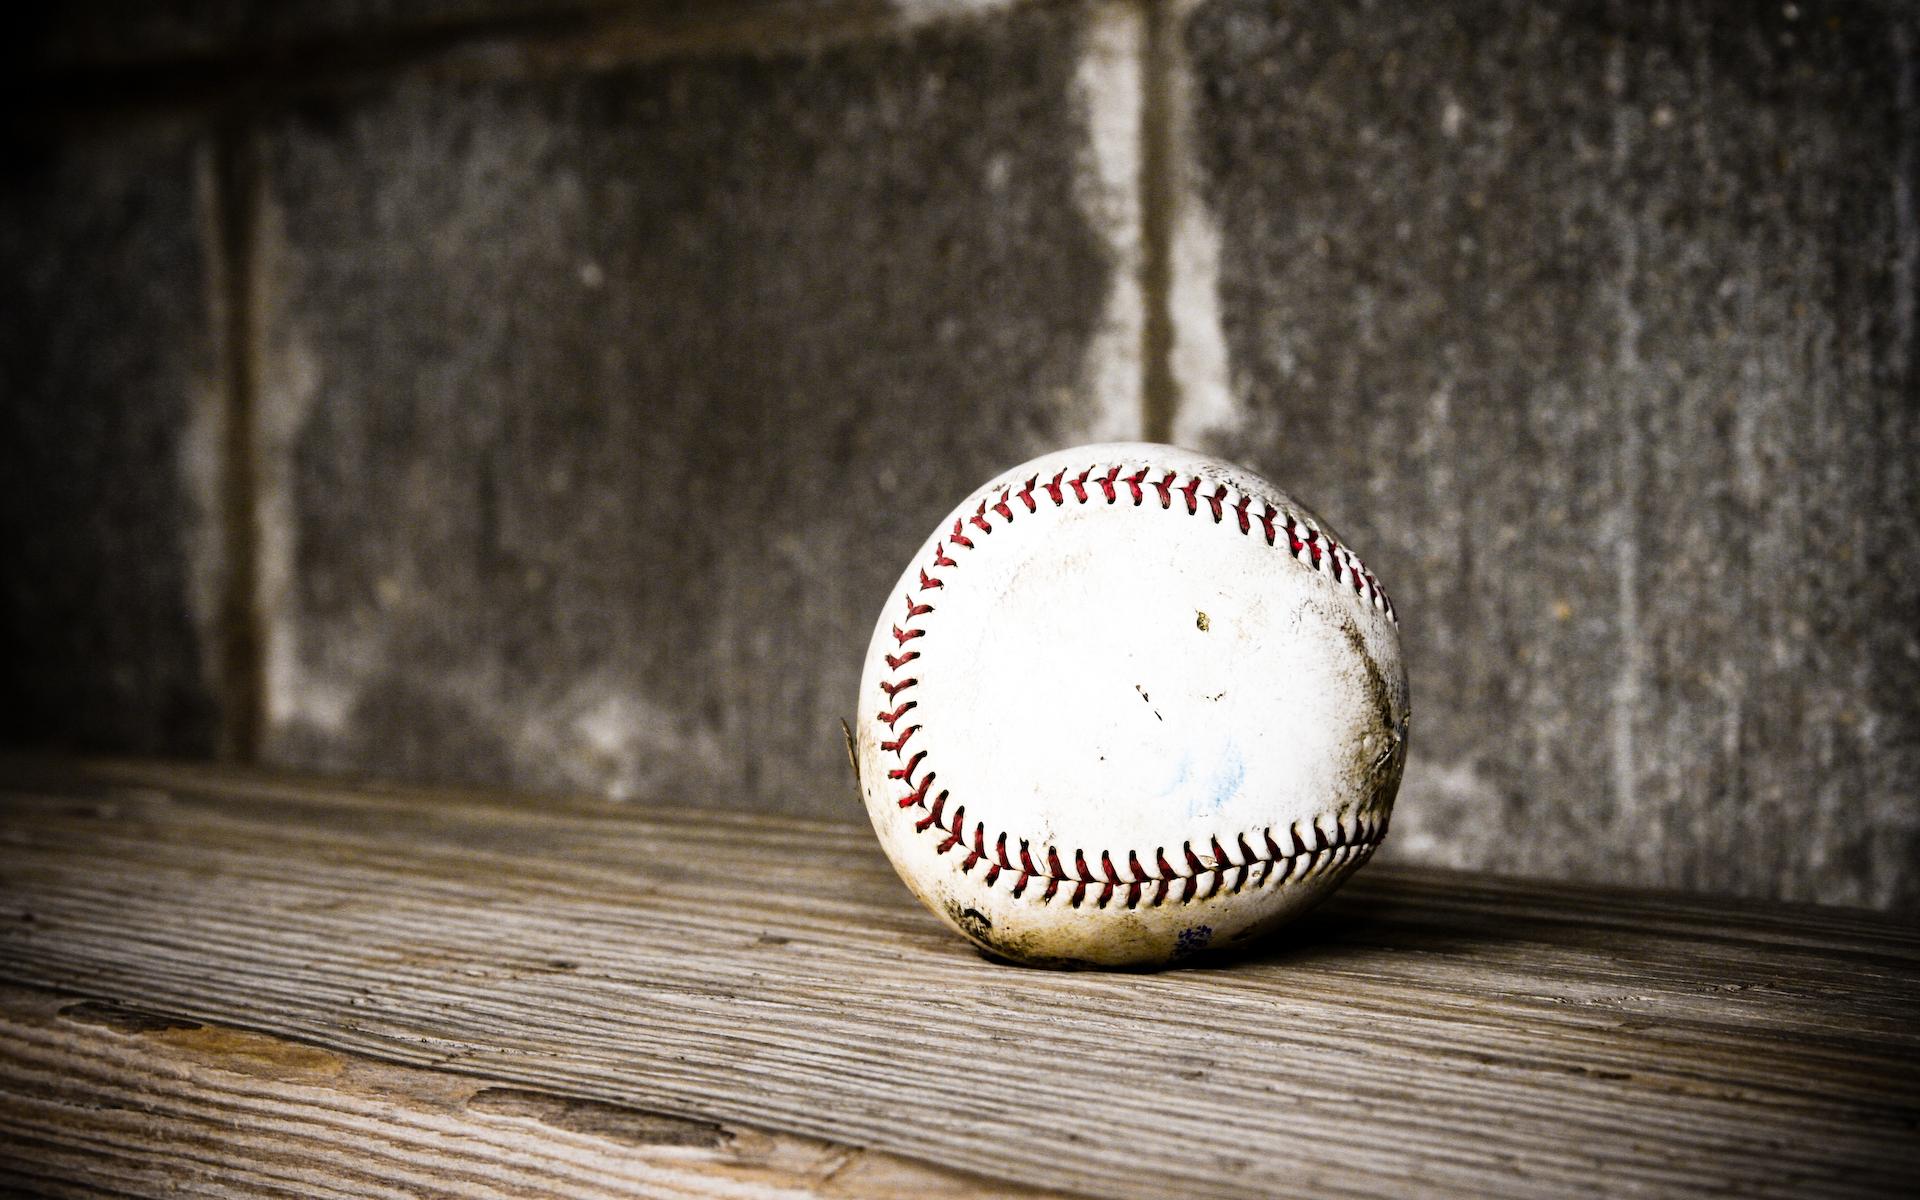 Baseball Wallpaper HD 1920x1200